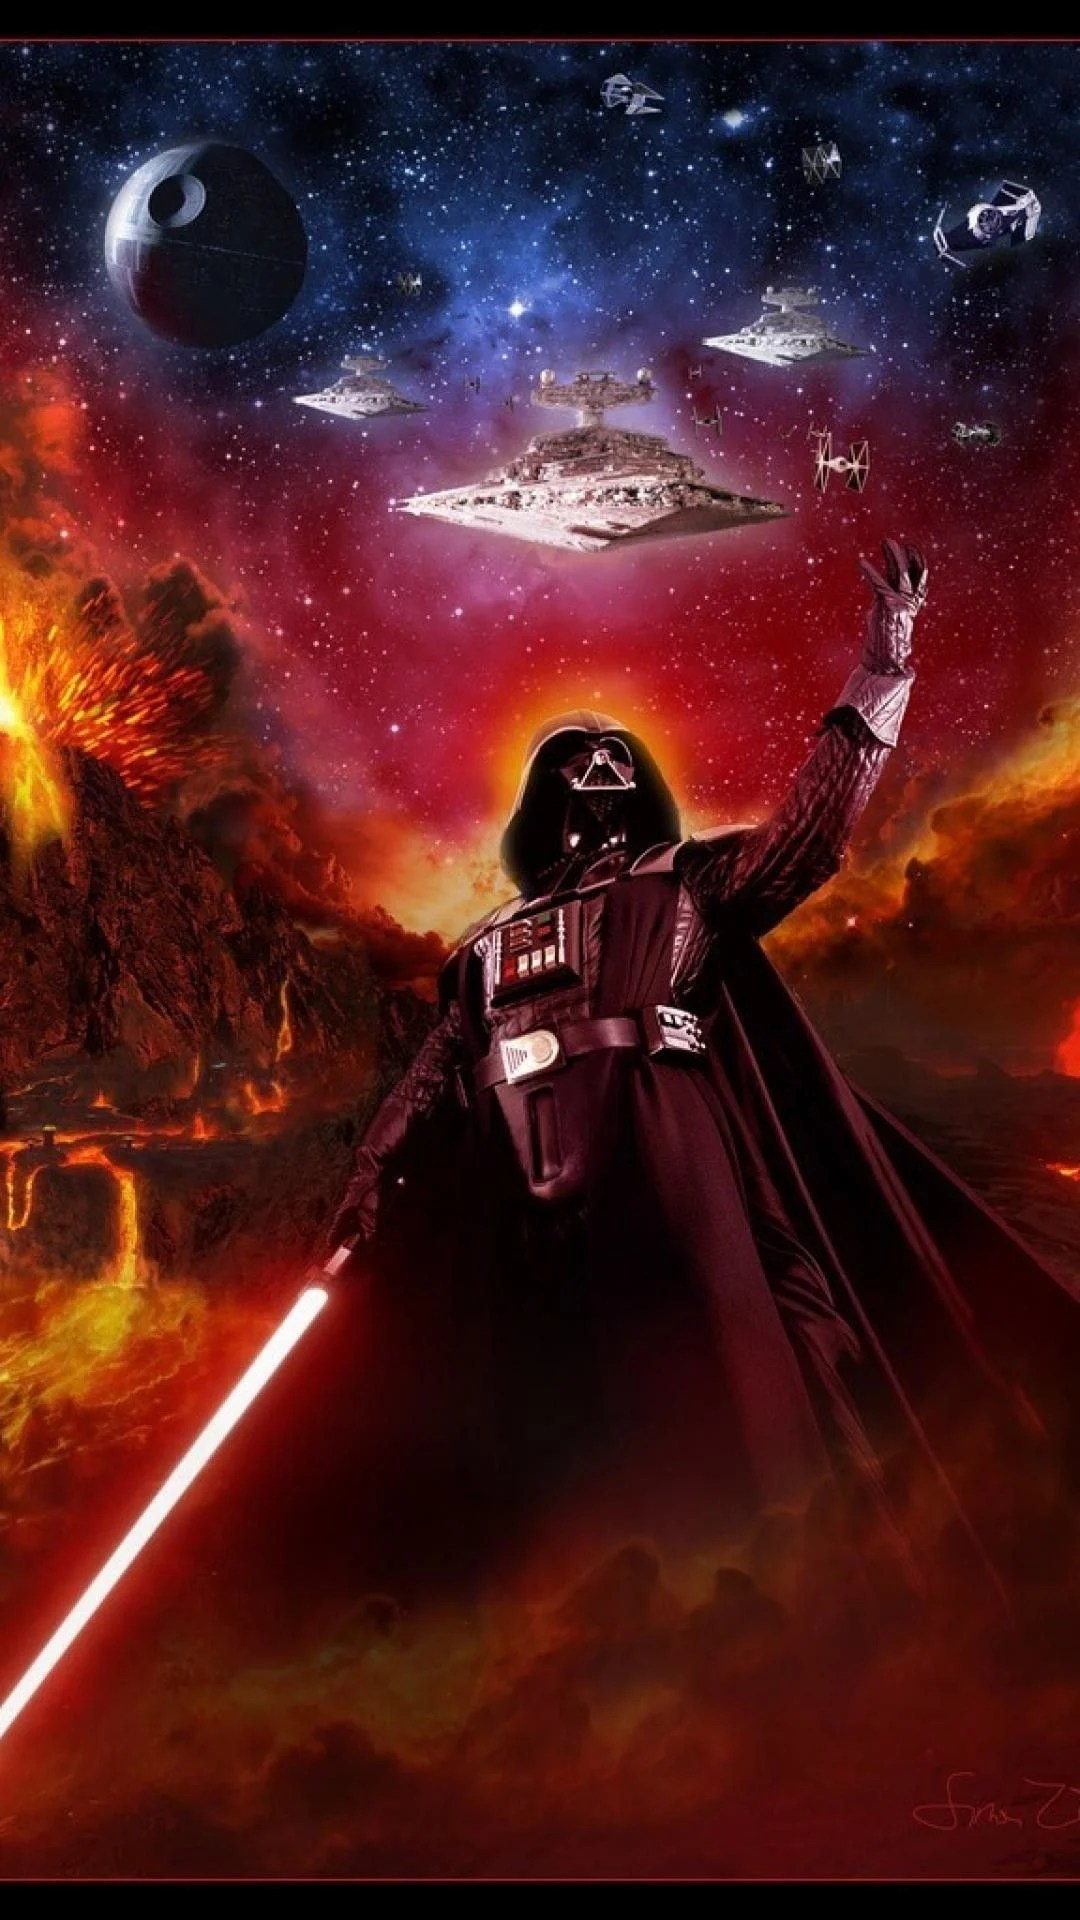 Download Star Wars Iphone Wallpaper Hd - Cool Star Wars